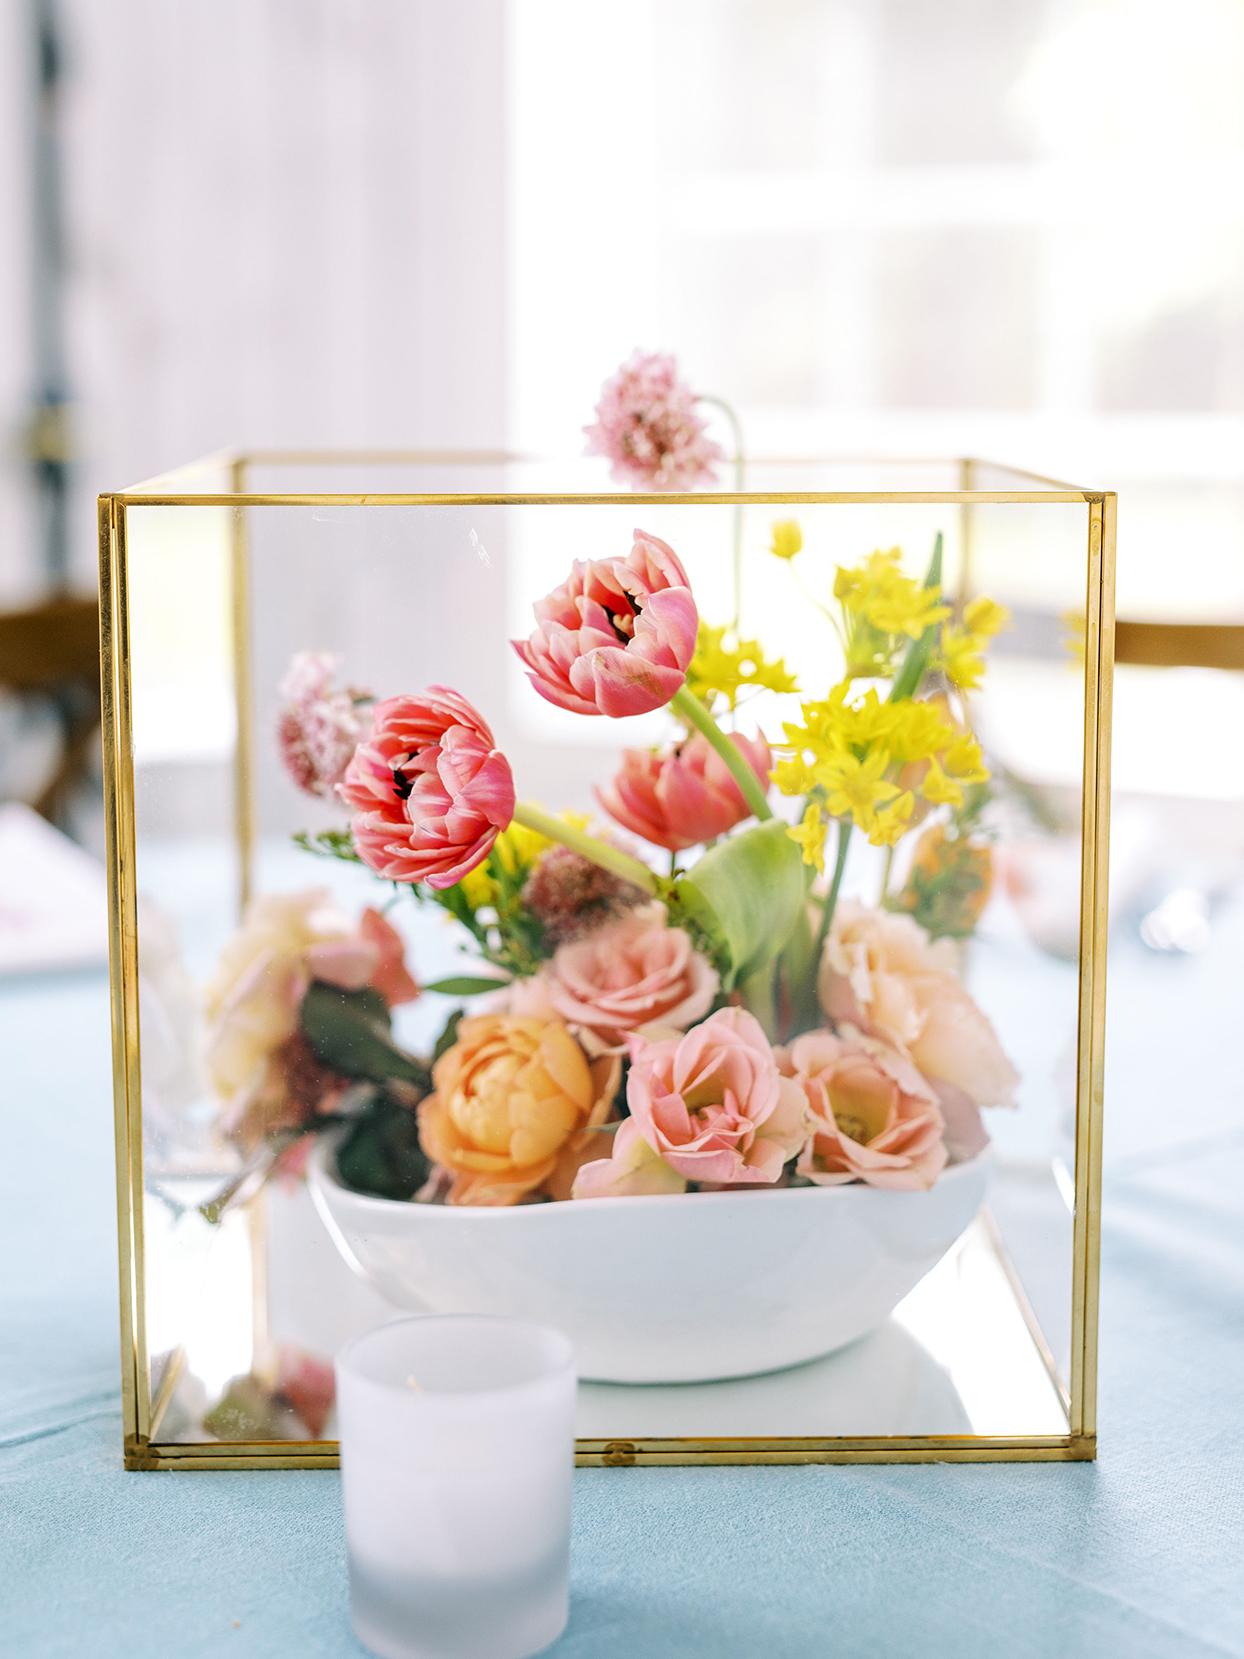 evie joe wedding reception centerpiece bouquet in glass display box